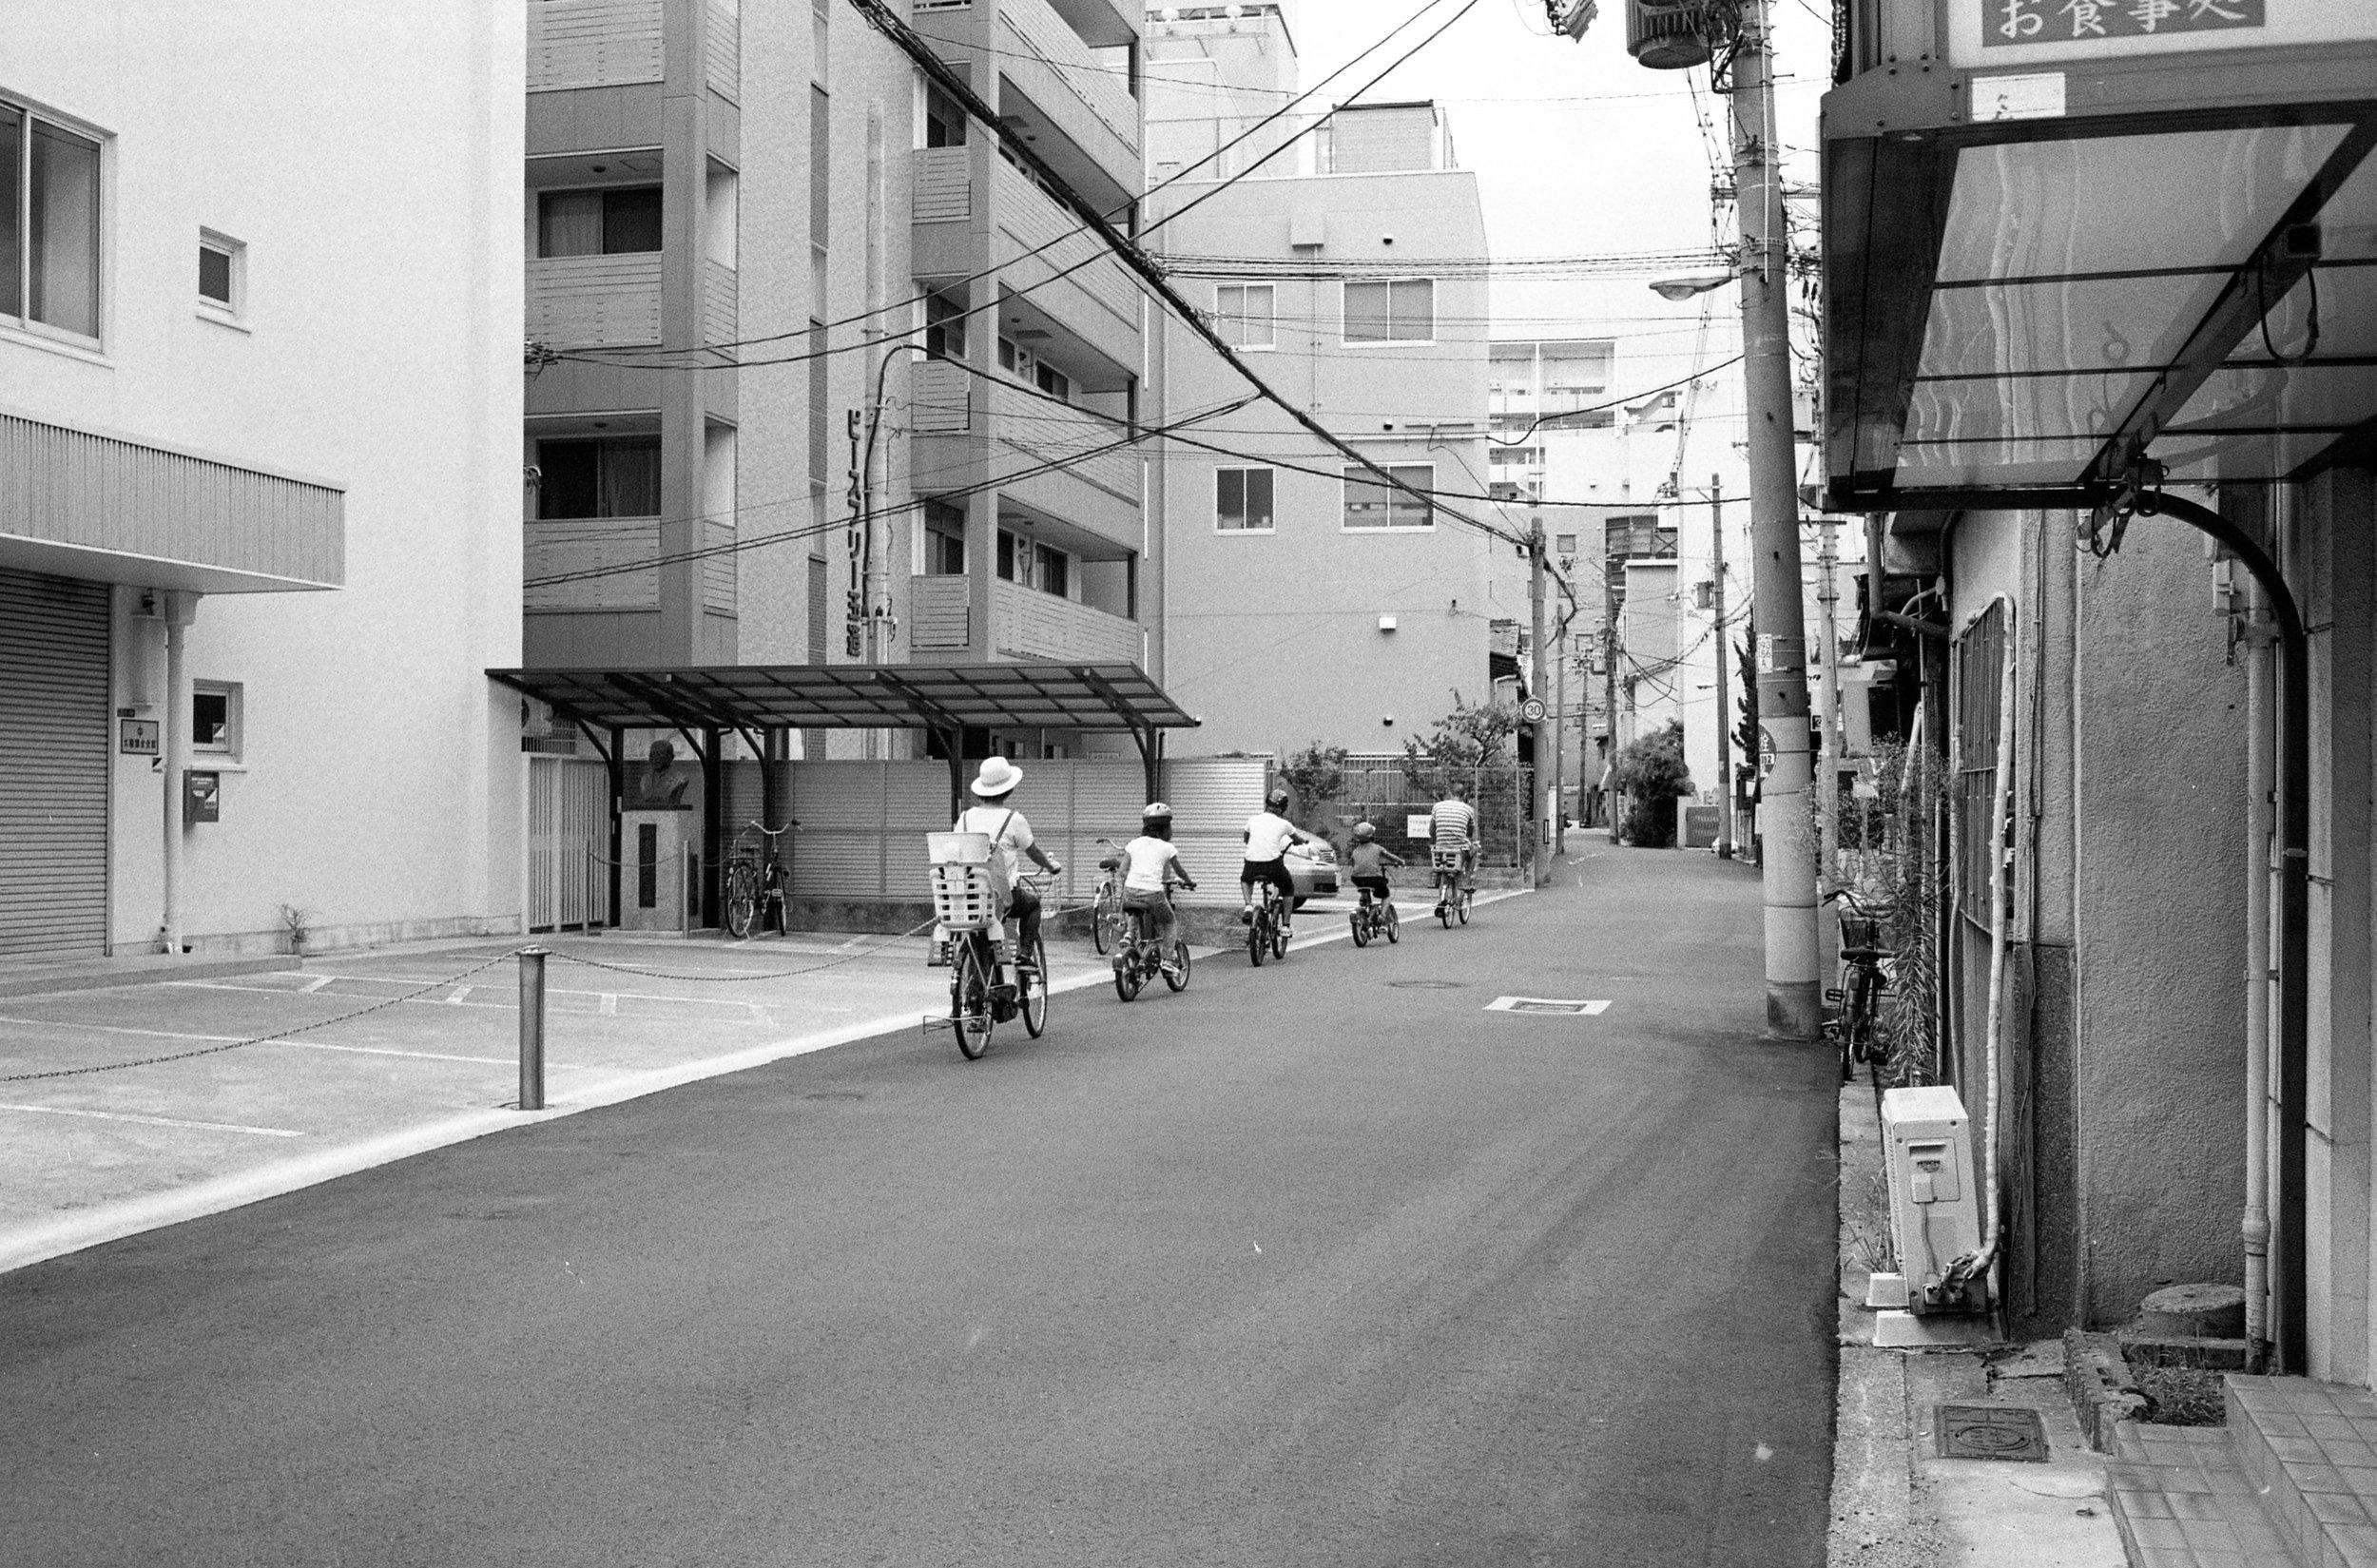 M6-TRIX400-800ISO-JAPANSUM18-OSAKALOOPLINE(Y)-MORINOYA-036.jpg